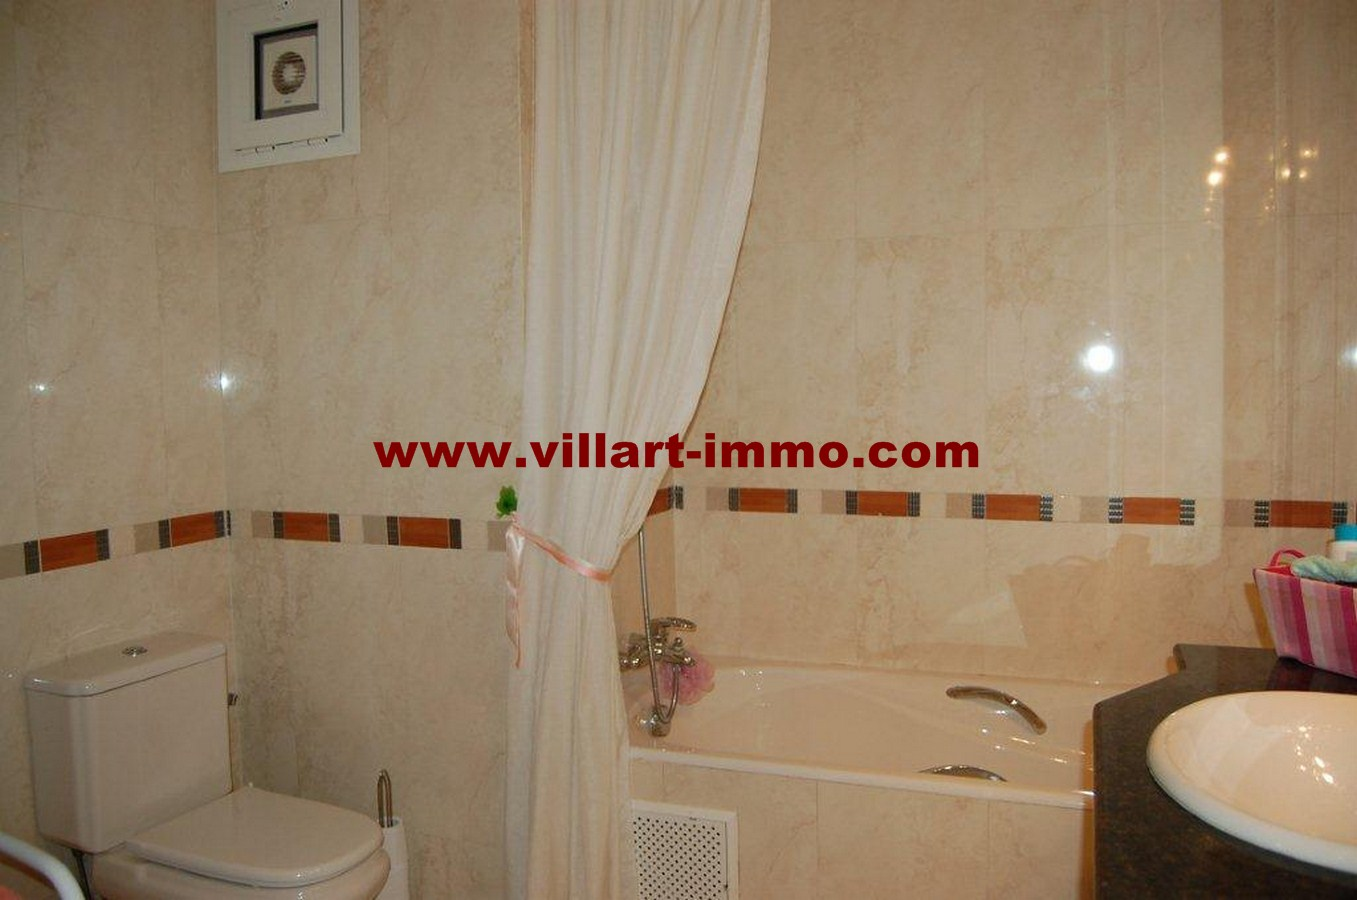 12-vente-appartement-tanger-la-montagne-salle-de-bain-2-va452-villart-immo